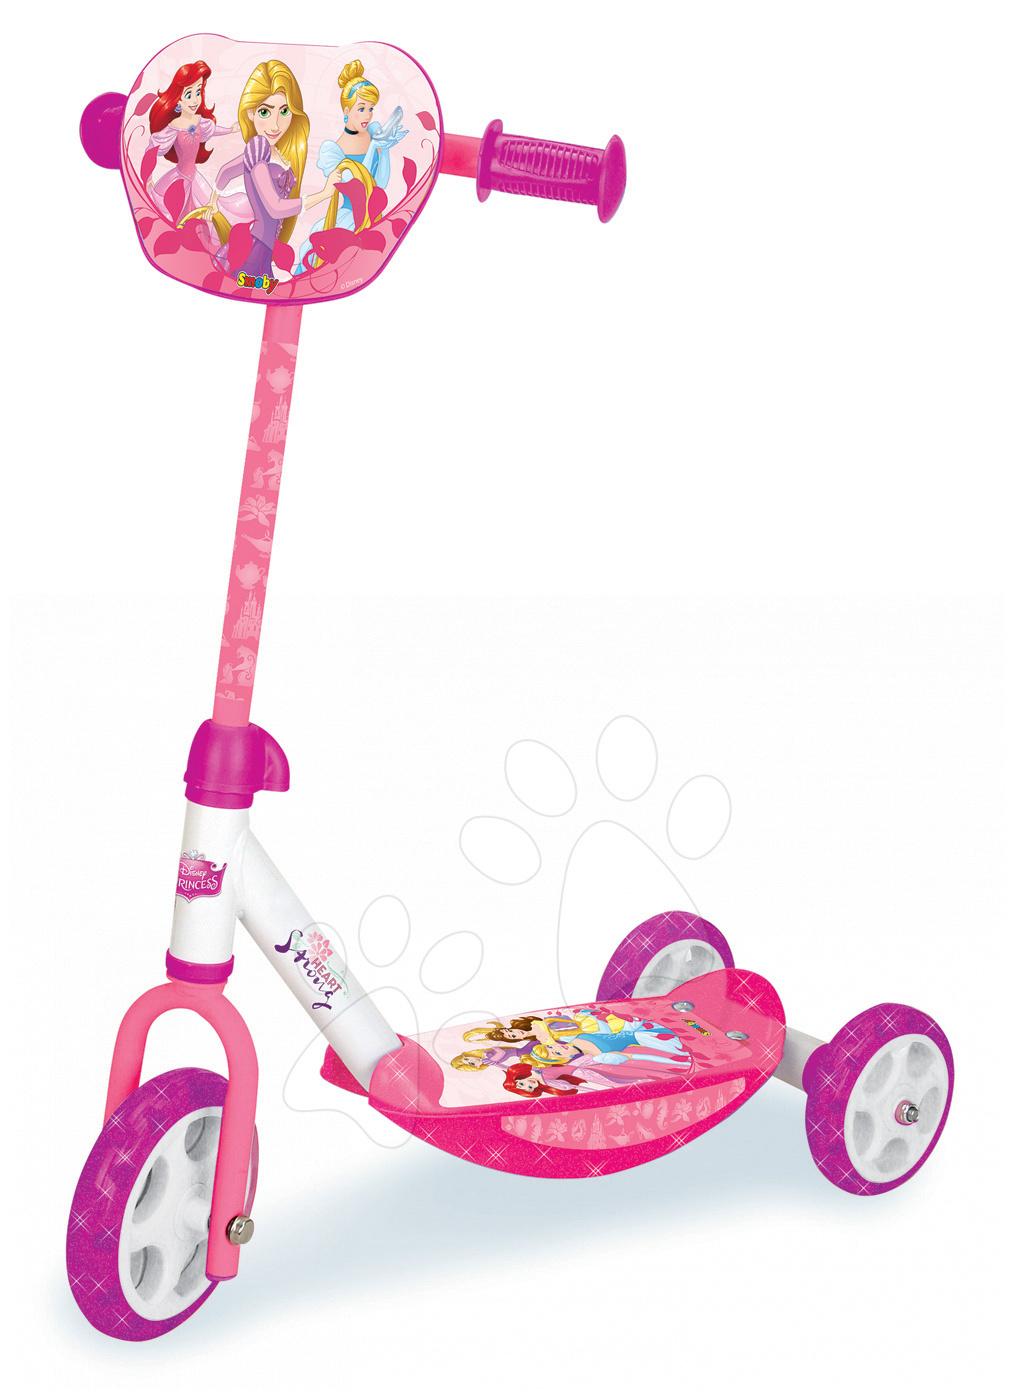 Dječji romobili - Romobil na tri kotača Disney Princeze Smoby s prilagodljivom ručkom od 2.5 godine